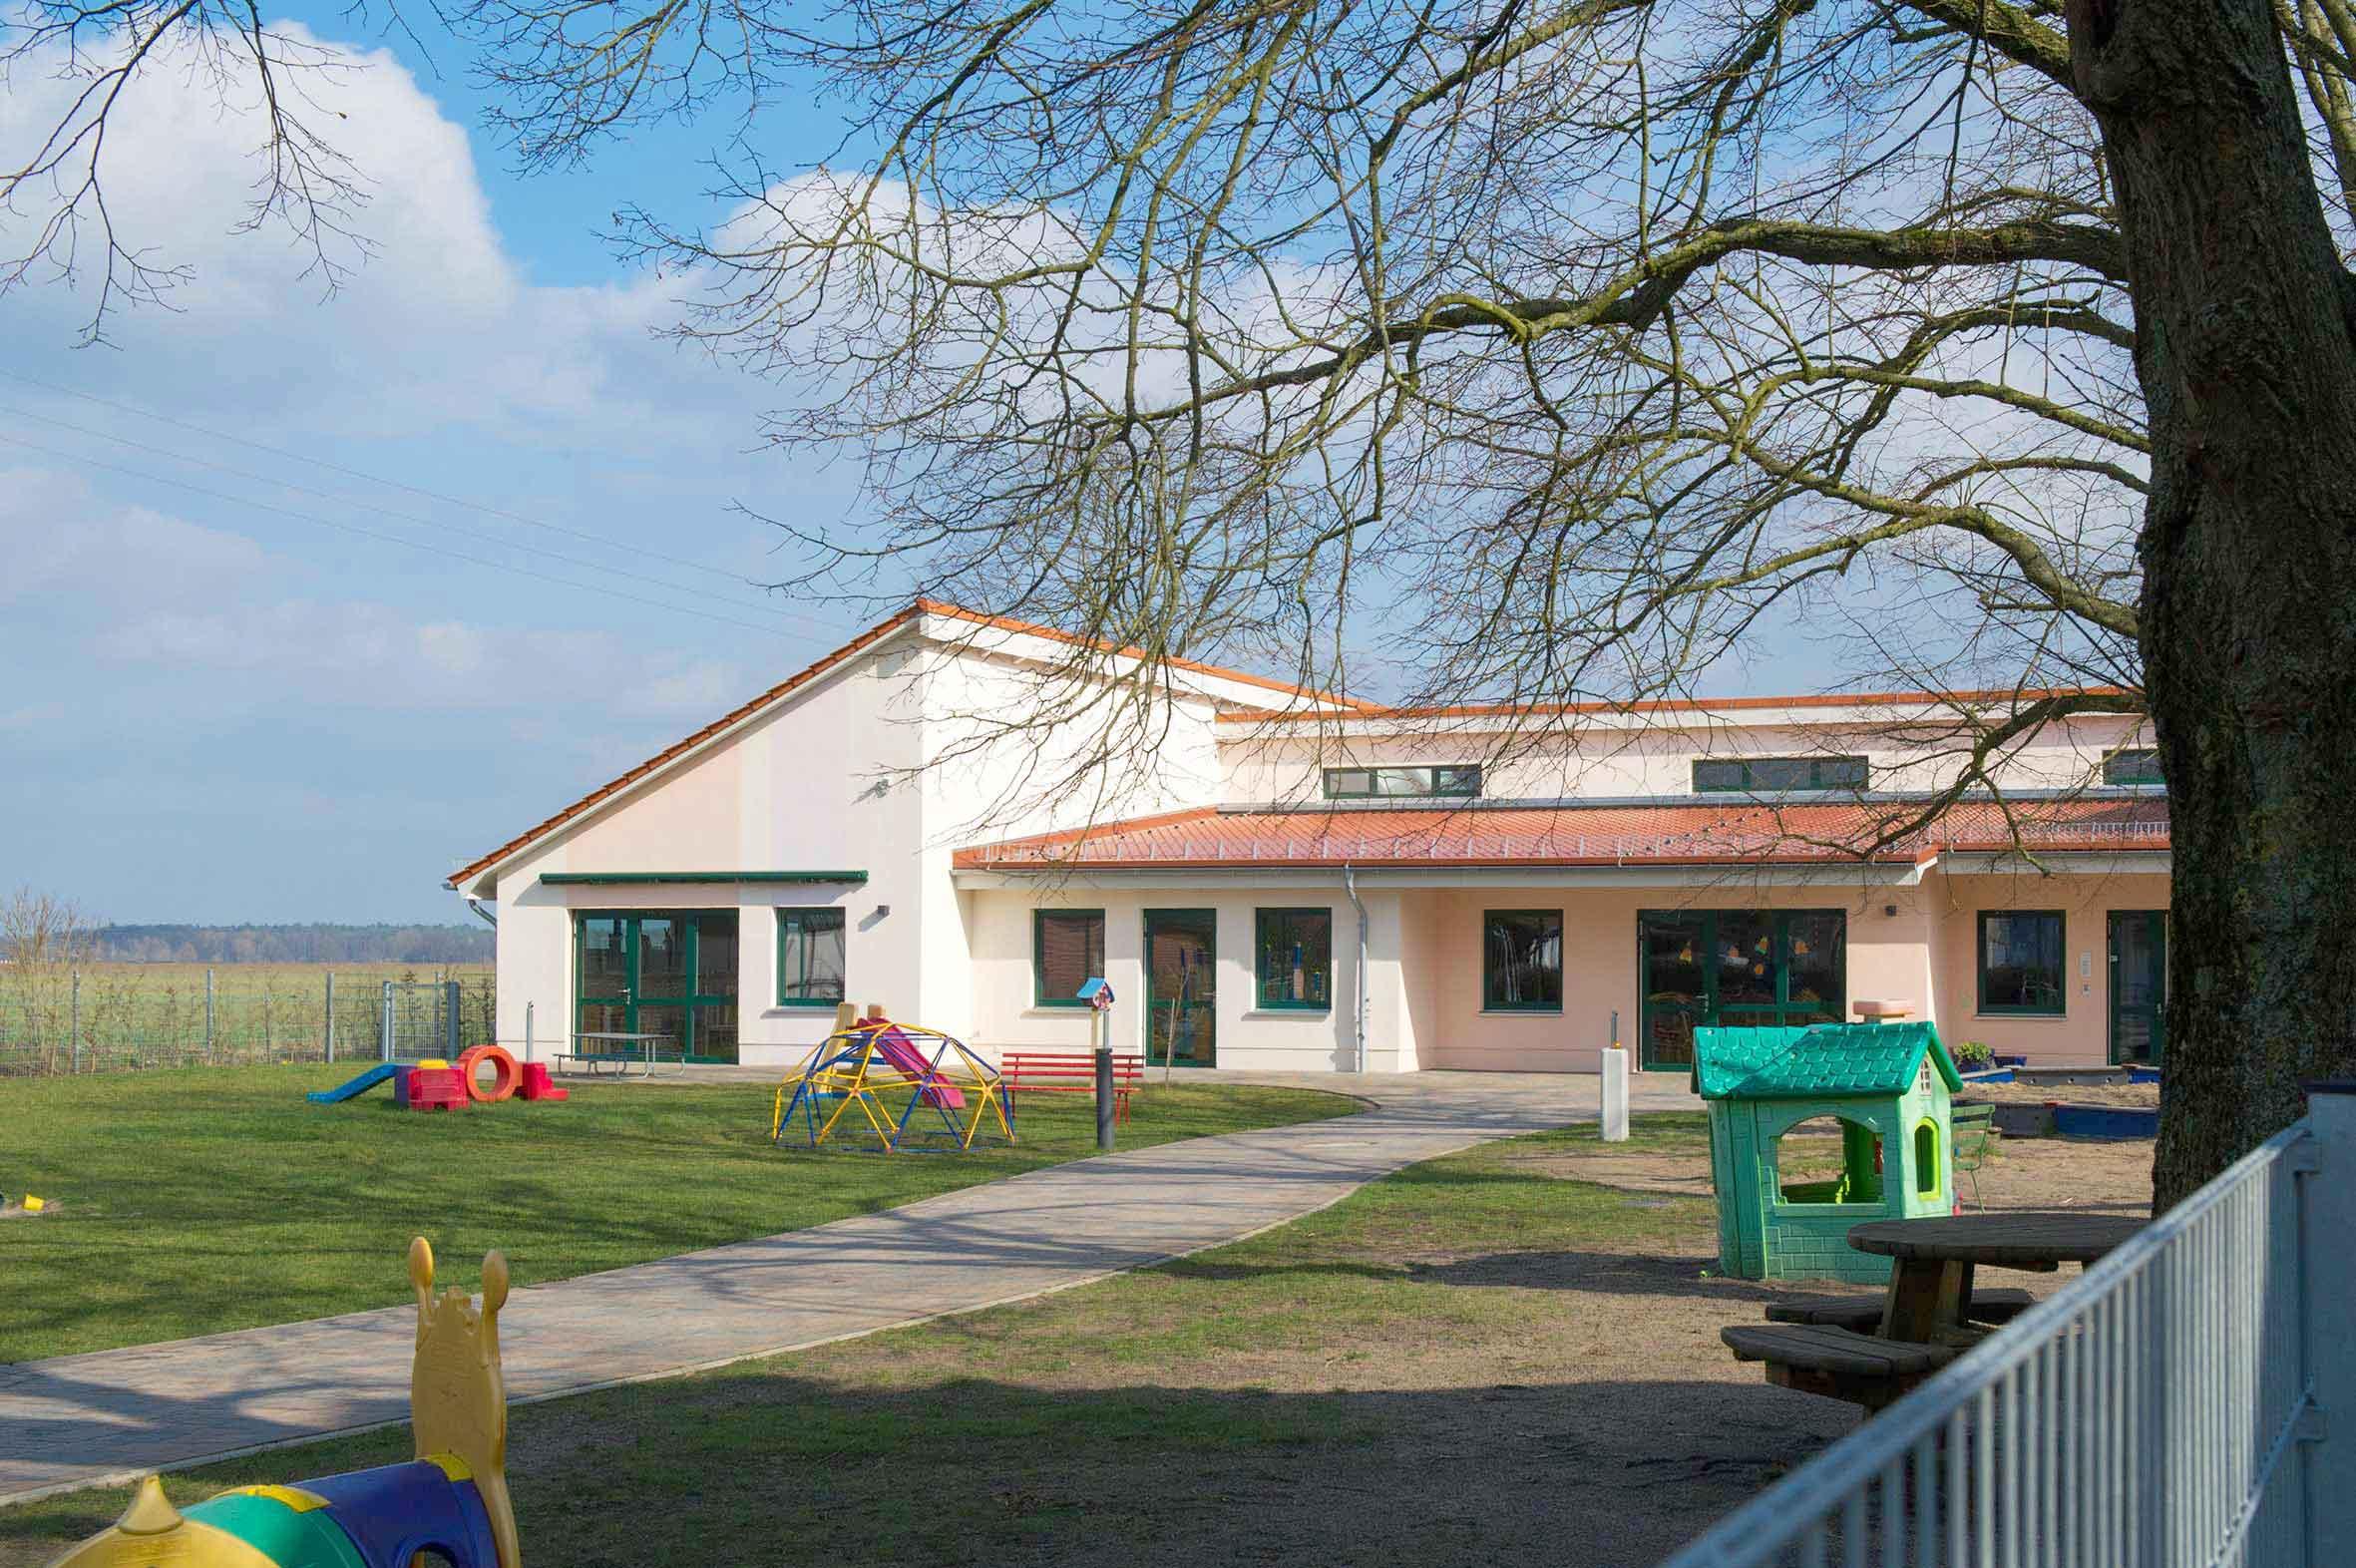 Bloomfeld_Natur_Grundstück_erwerben_Zahrensdorf_NeuGülze_Kinderkarten